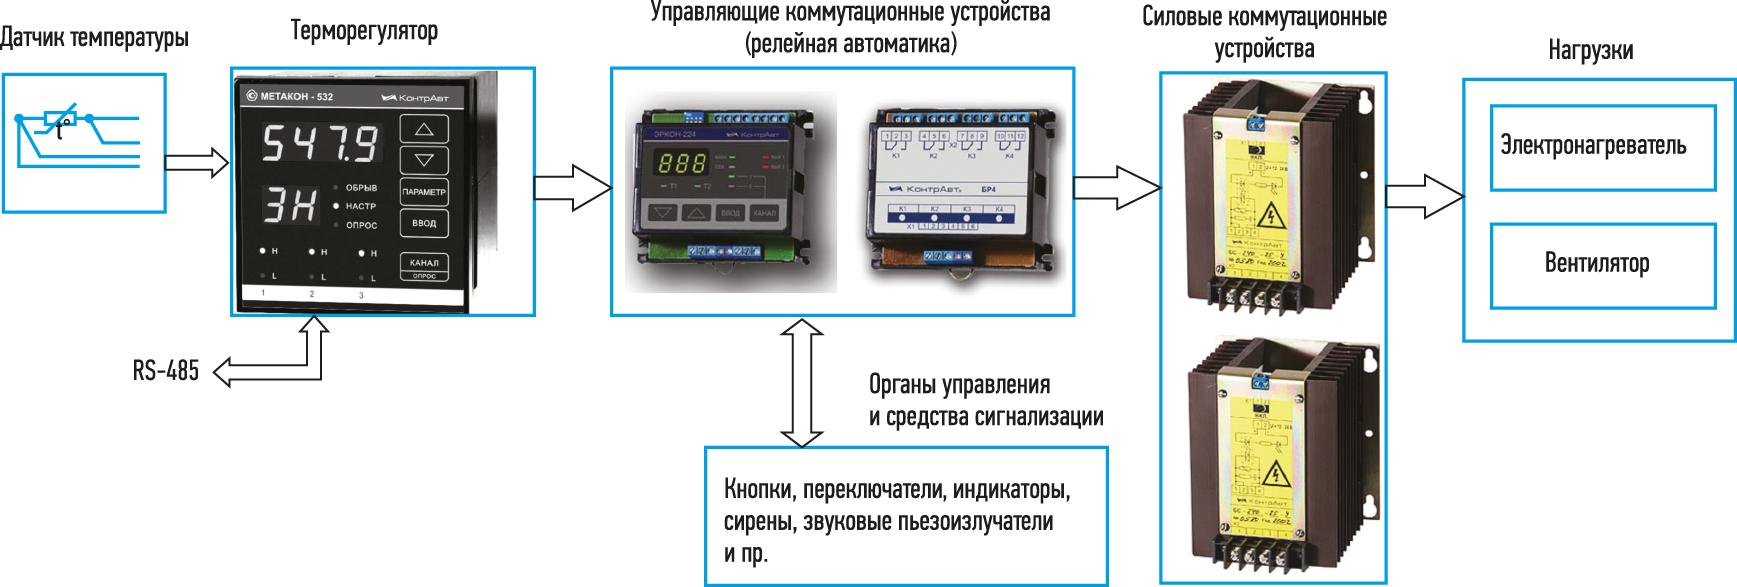 Схемы асу тп с датчиками